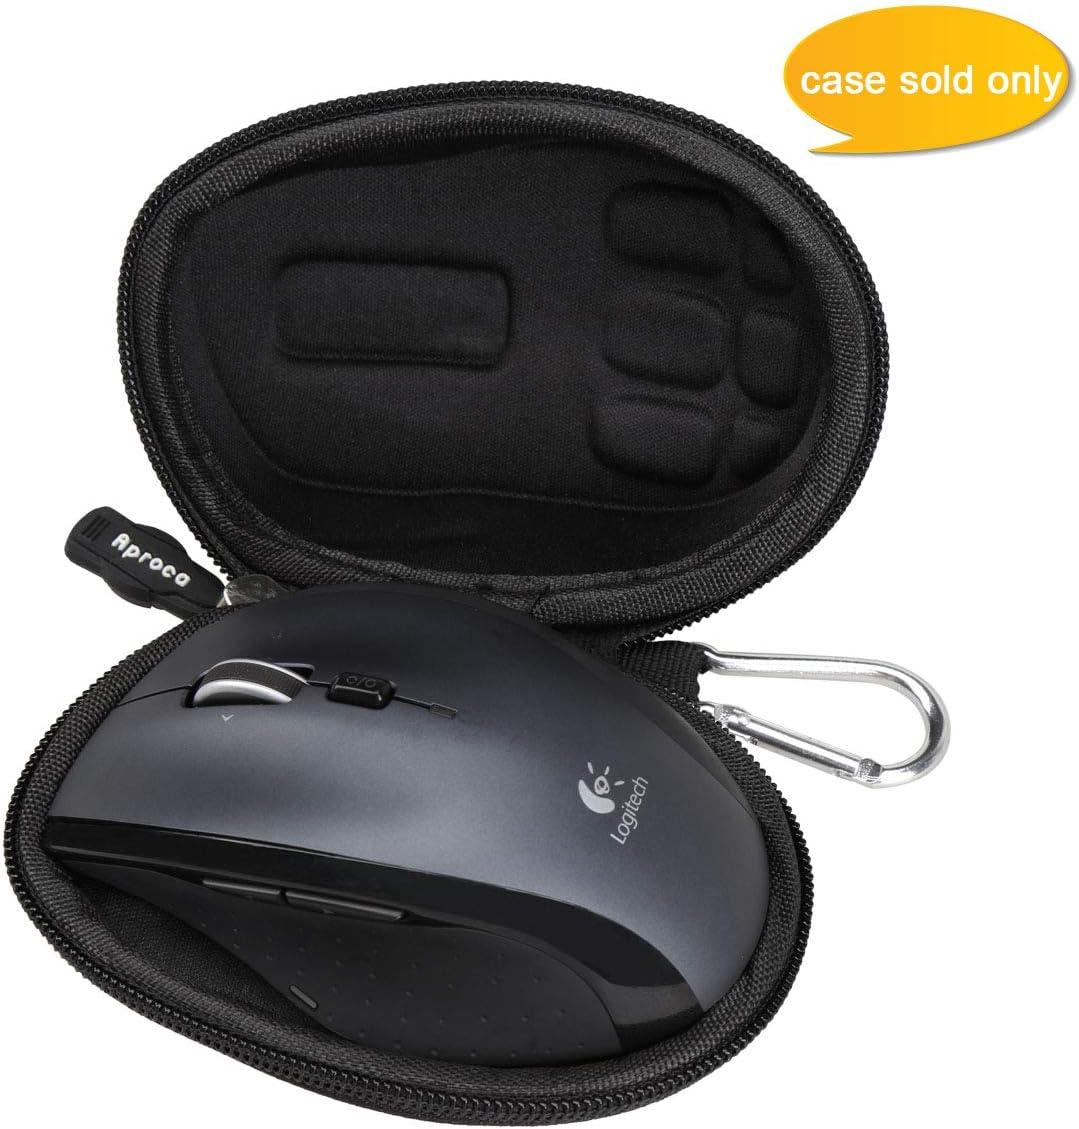 Aproca Hard Travel Storage Case, for Logitech M705 Marathon Wireless Mouse(only case)